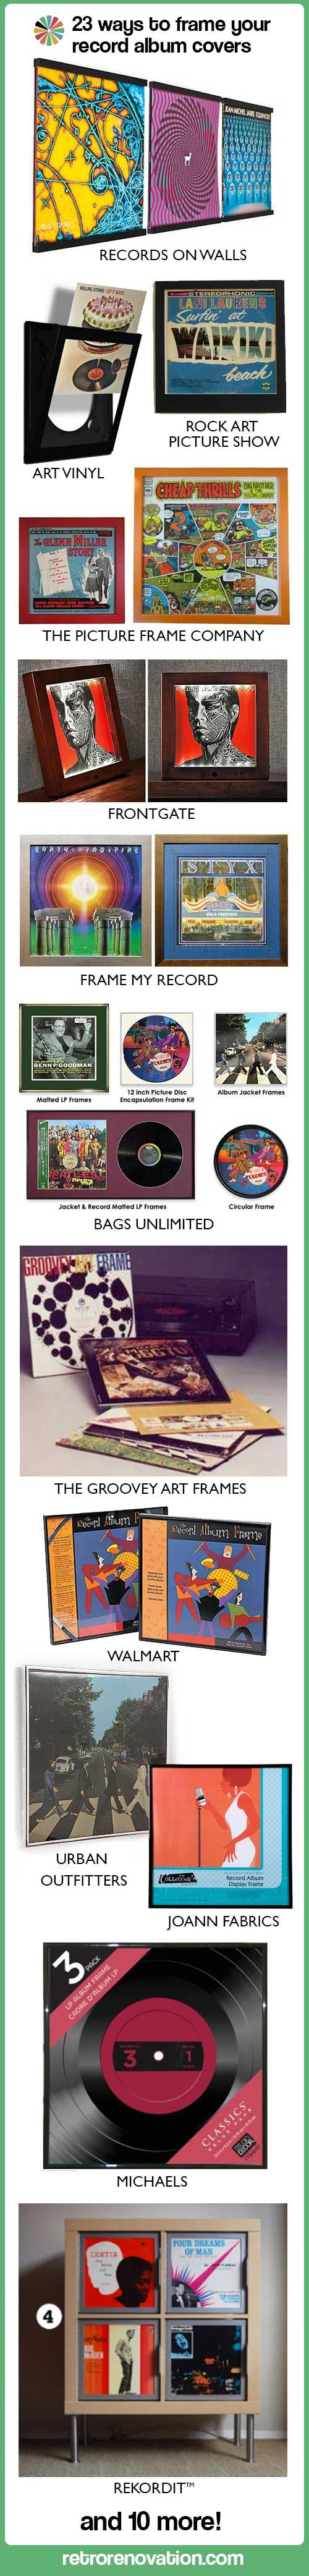 Best Images About Vinyl Record Storage Ideas Pinterest Vinyls Lps And Metal Racks